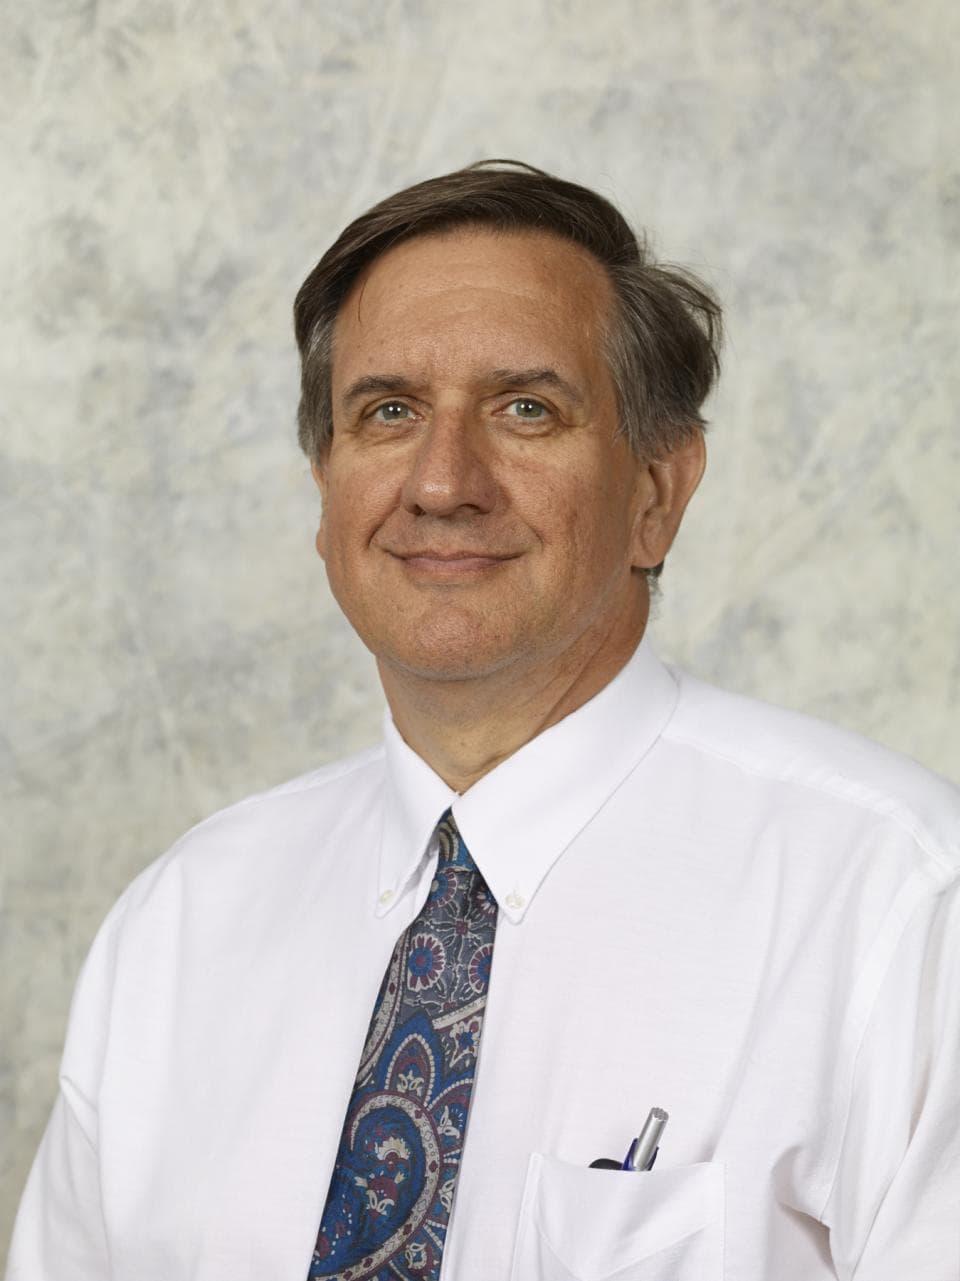 Dr. Stephen G Keim MD